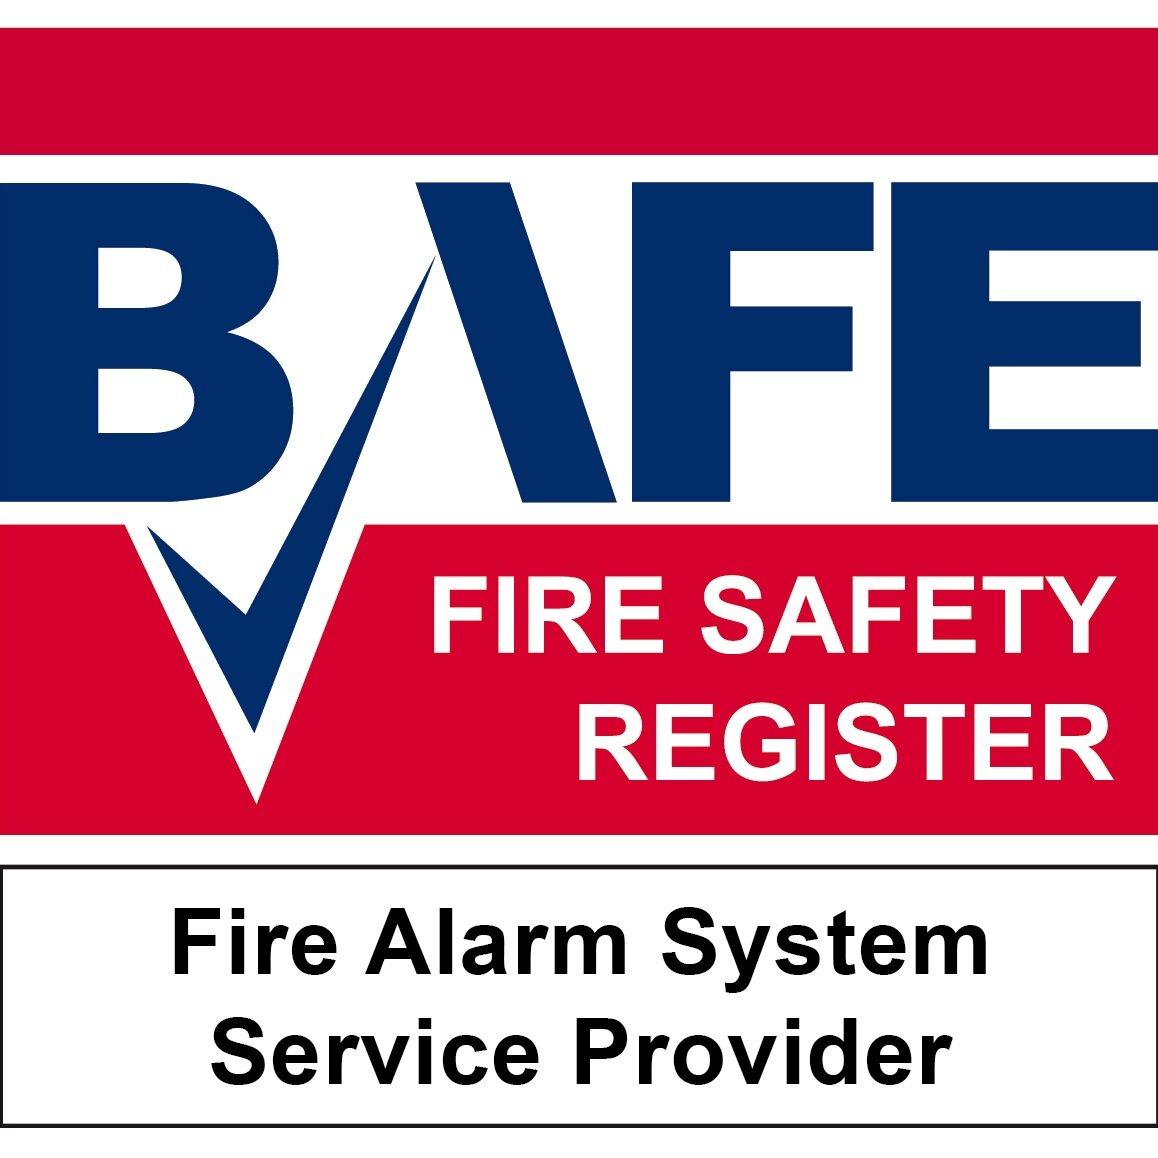 BAFE-SP203-1-Logo-JPG-RGB 2019.jpg